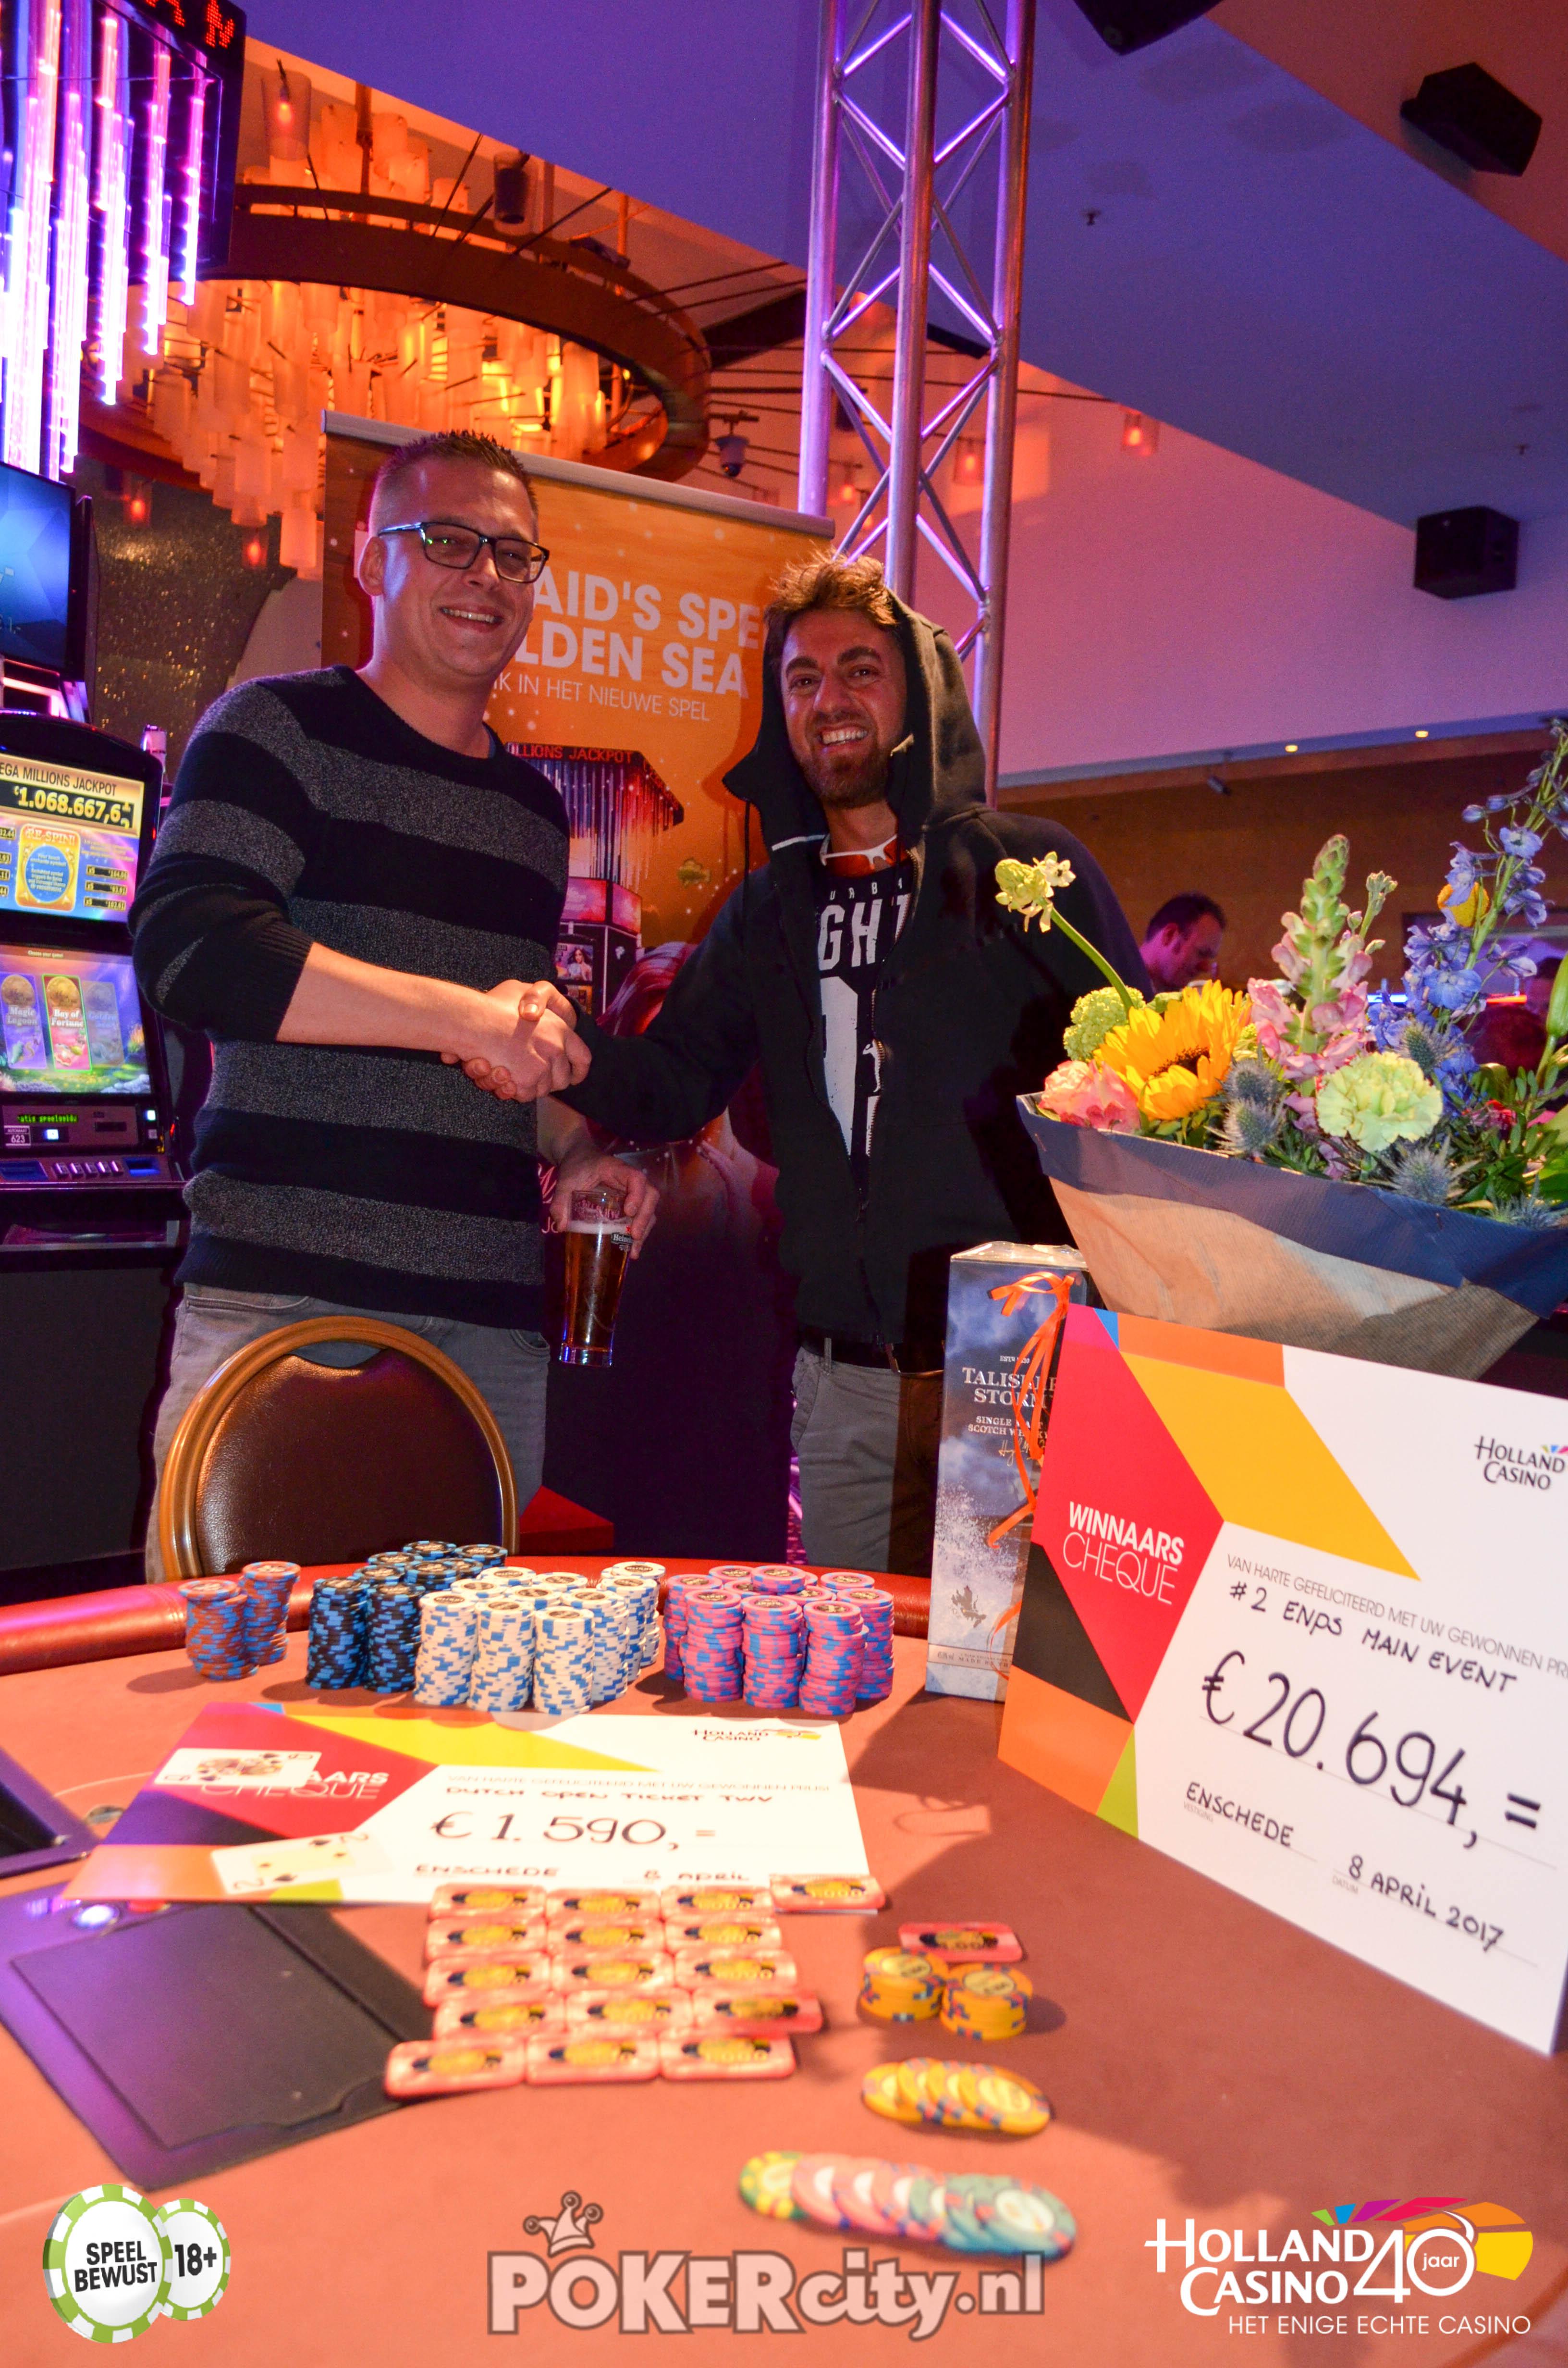 http://www.pokercity.nl/uploads/lrFoto/event1459/DSC_0250.jpg